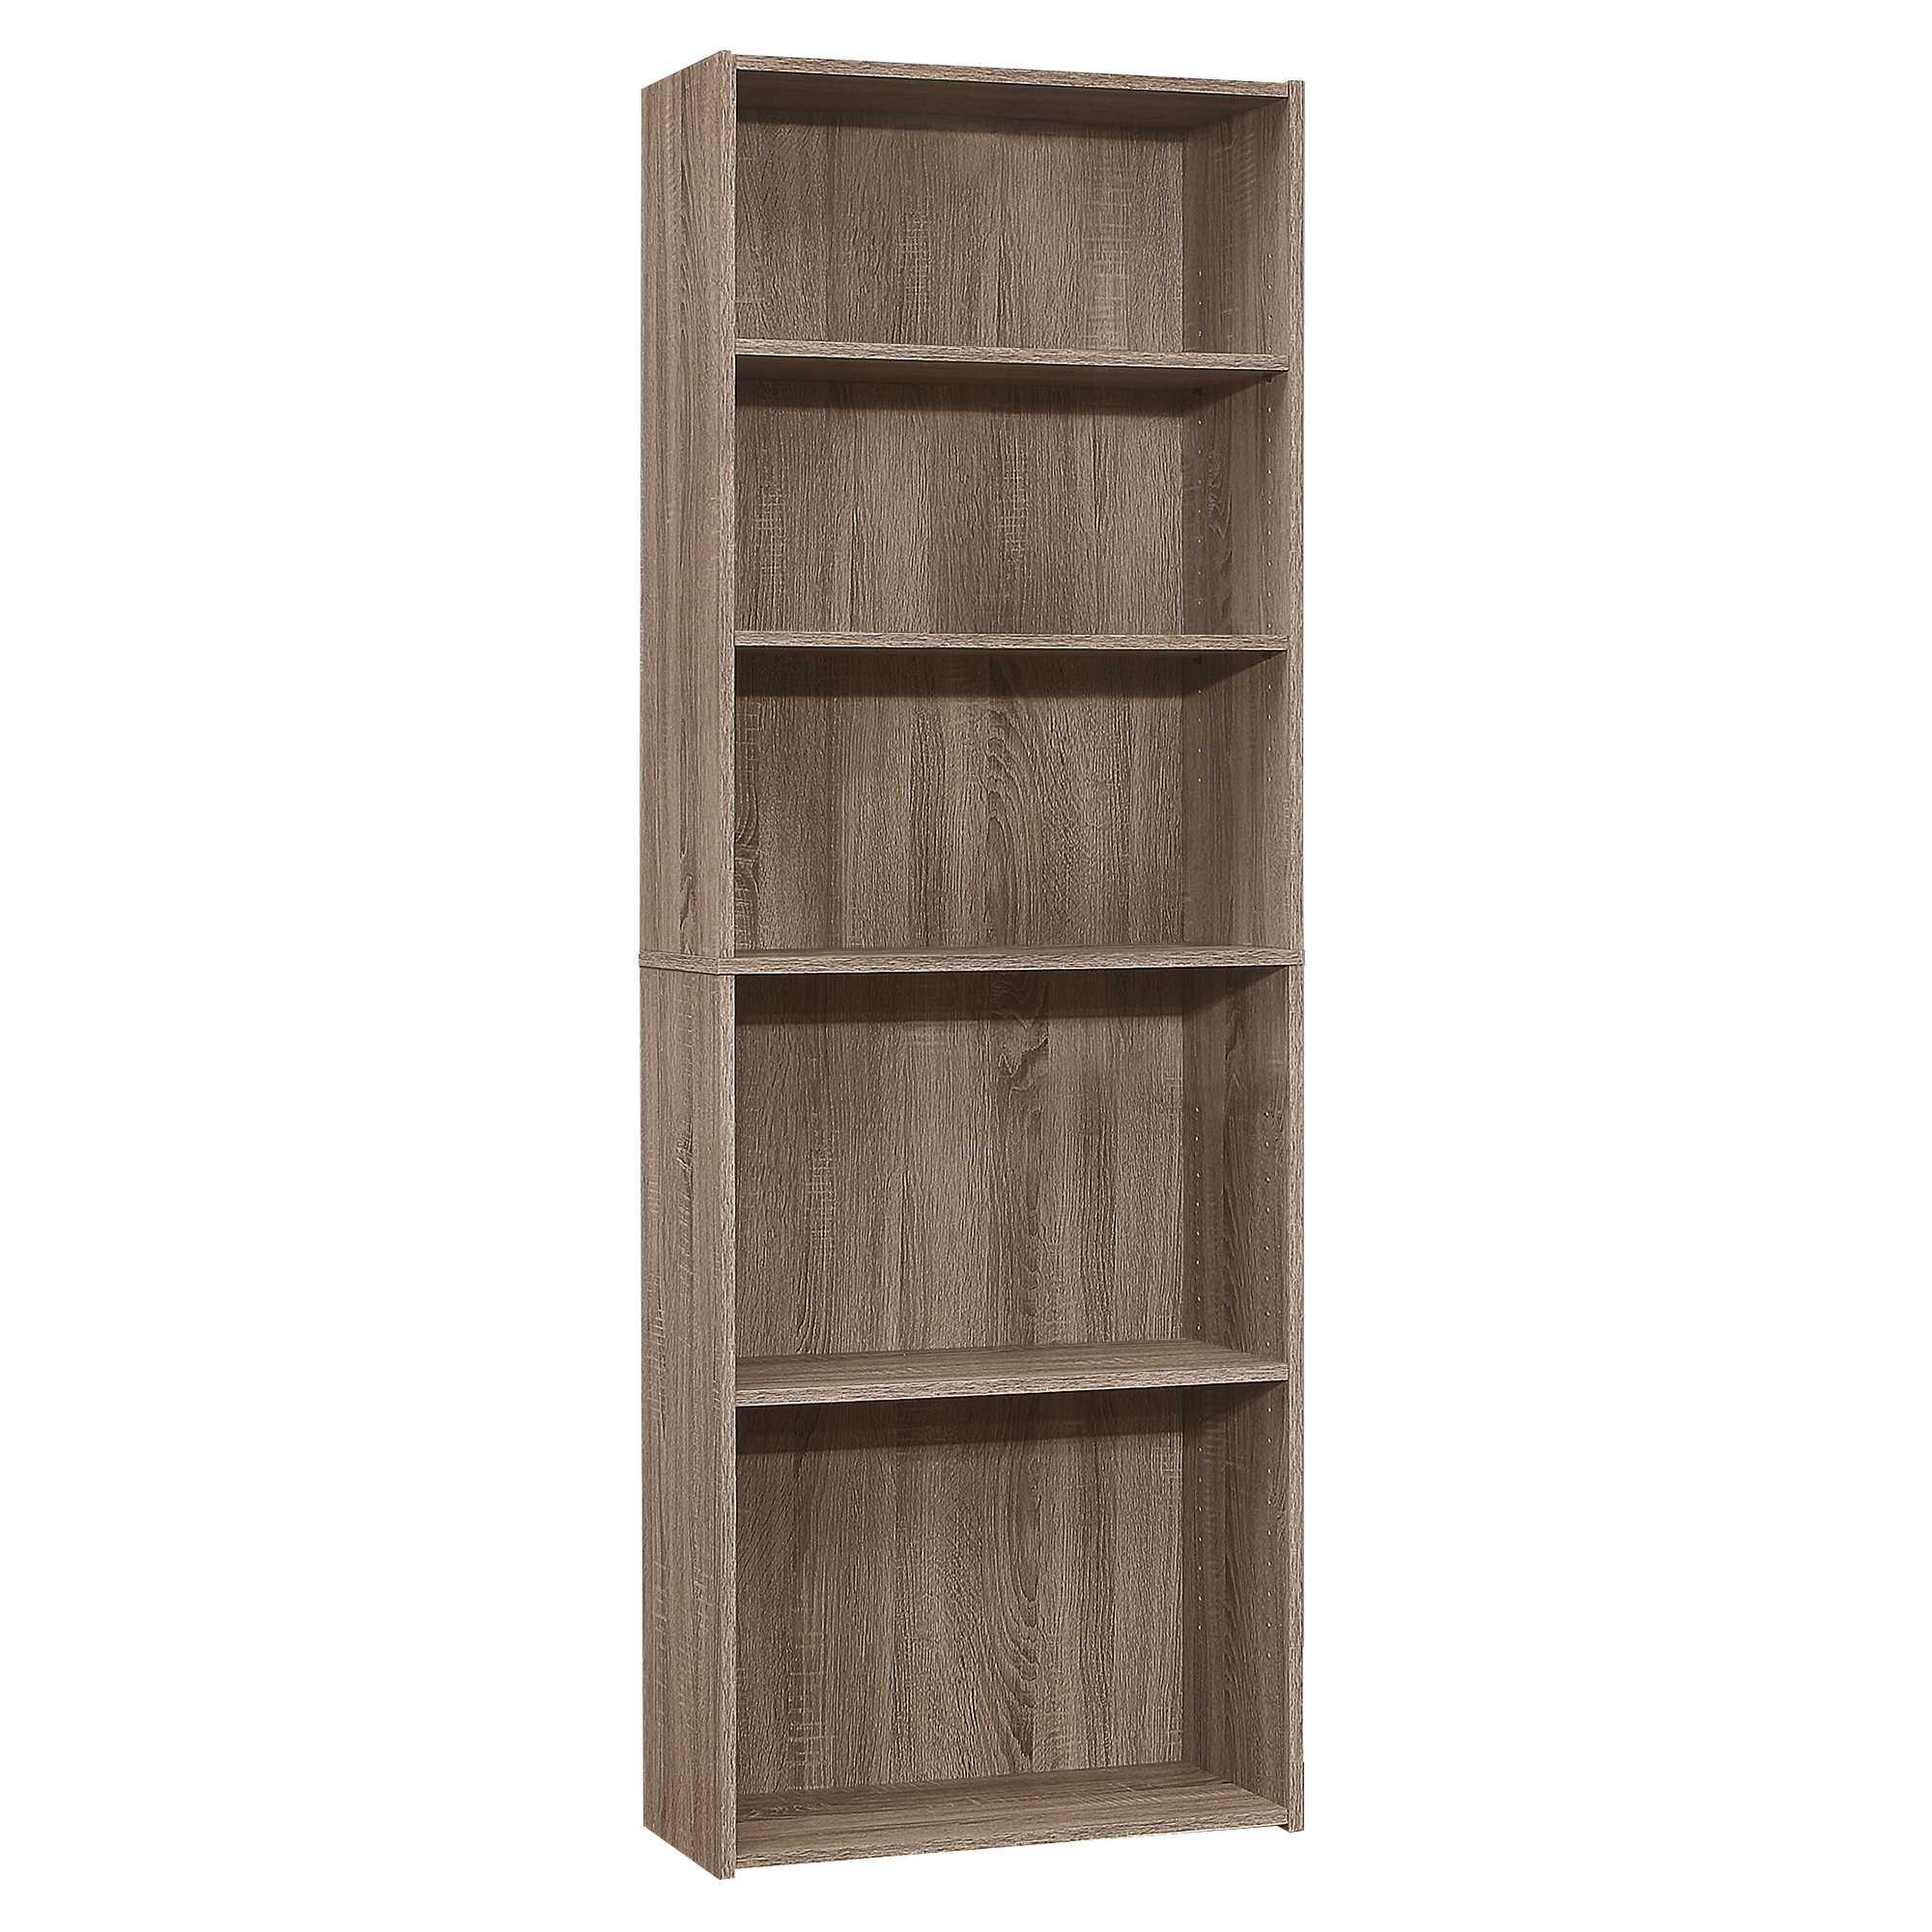 "11.75"" x 24.75"" x 71.25"" Dark Taupe 5 Shelves  Bookcase"